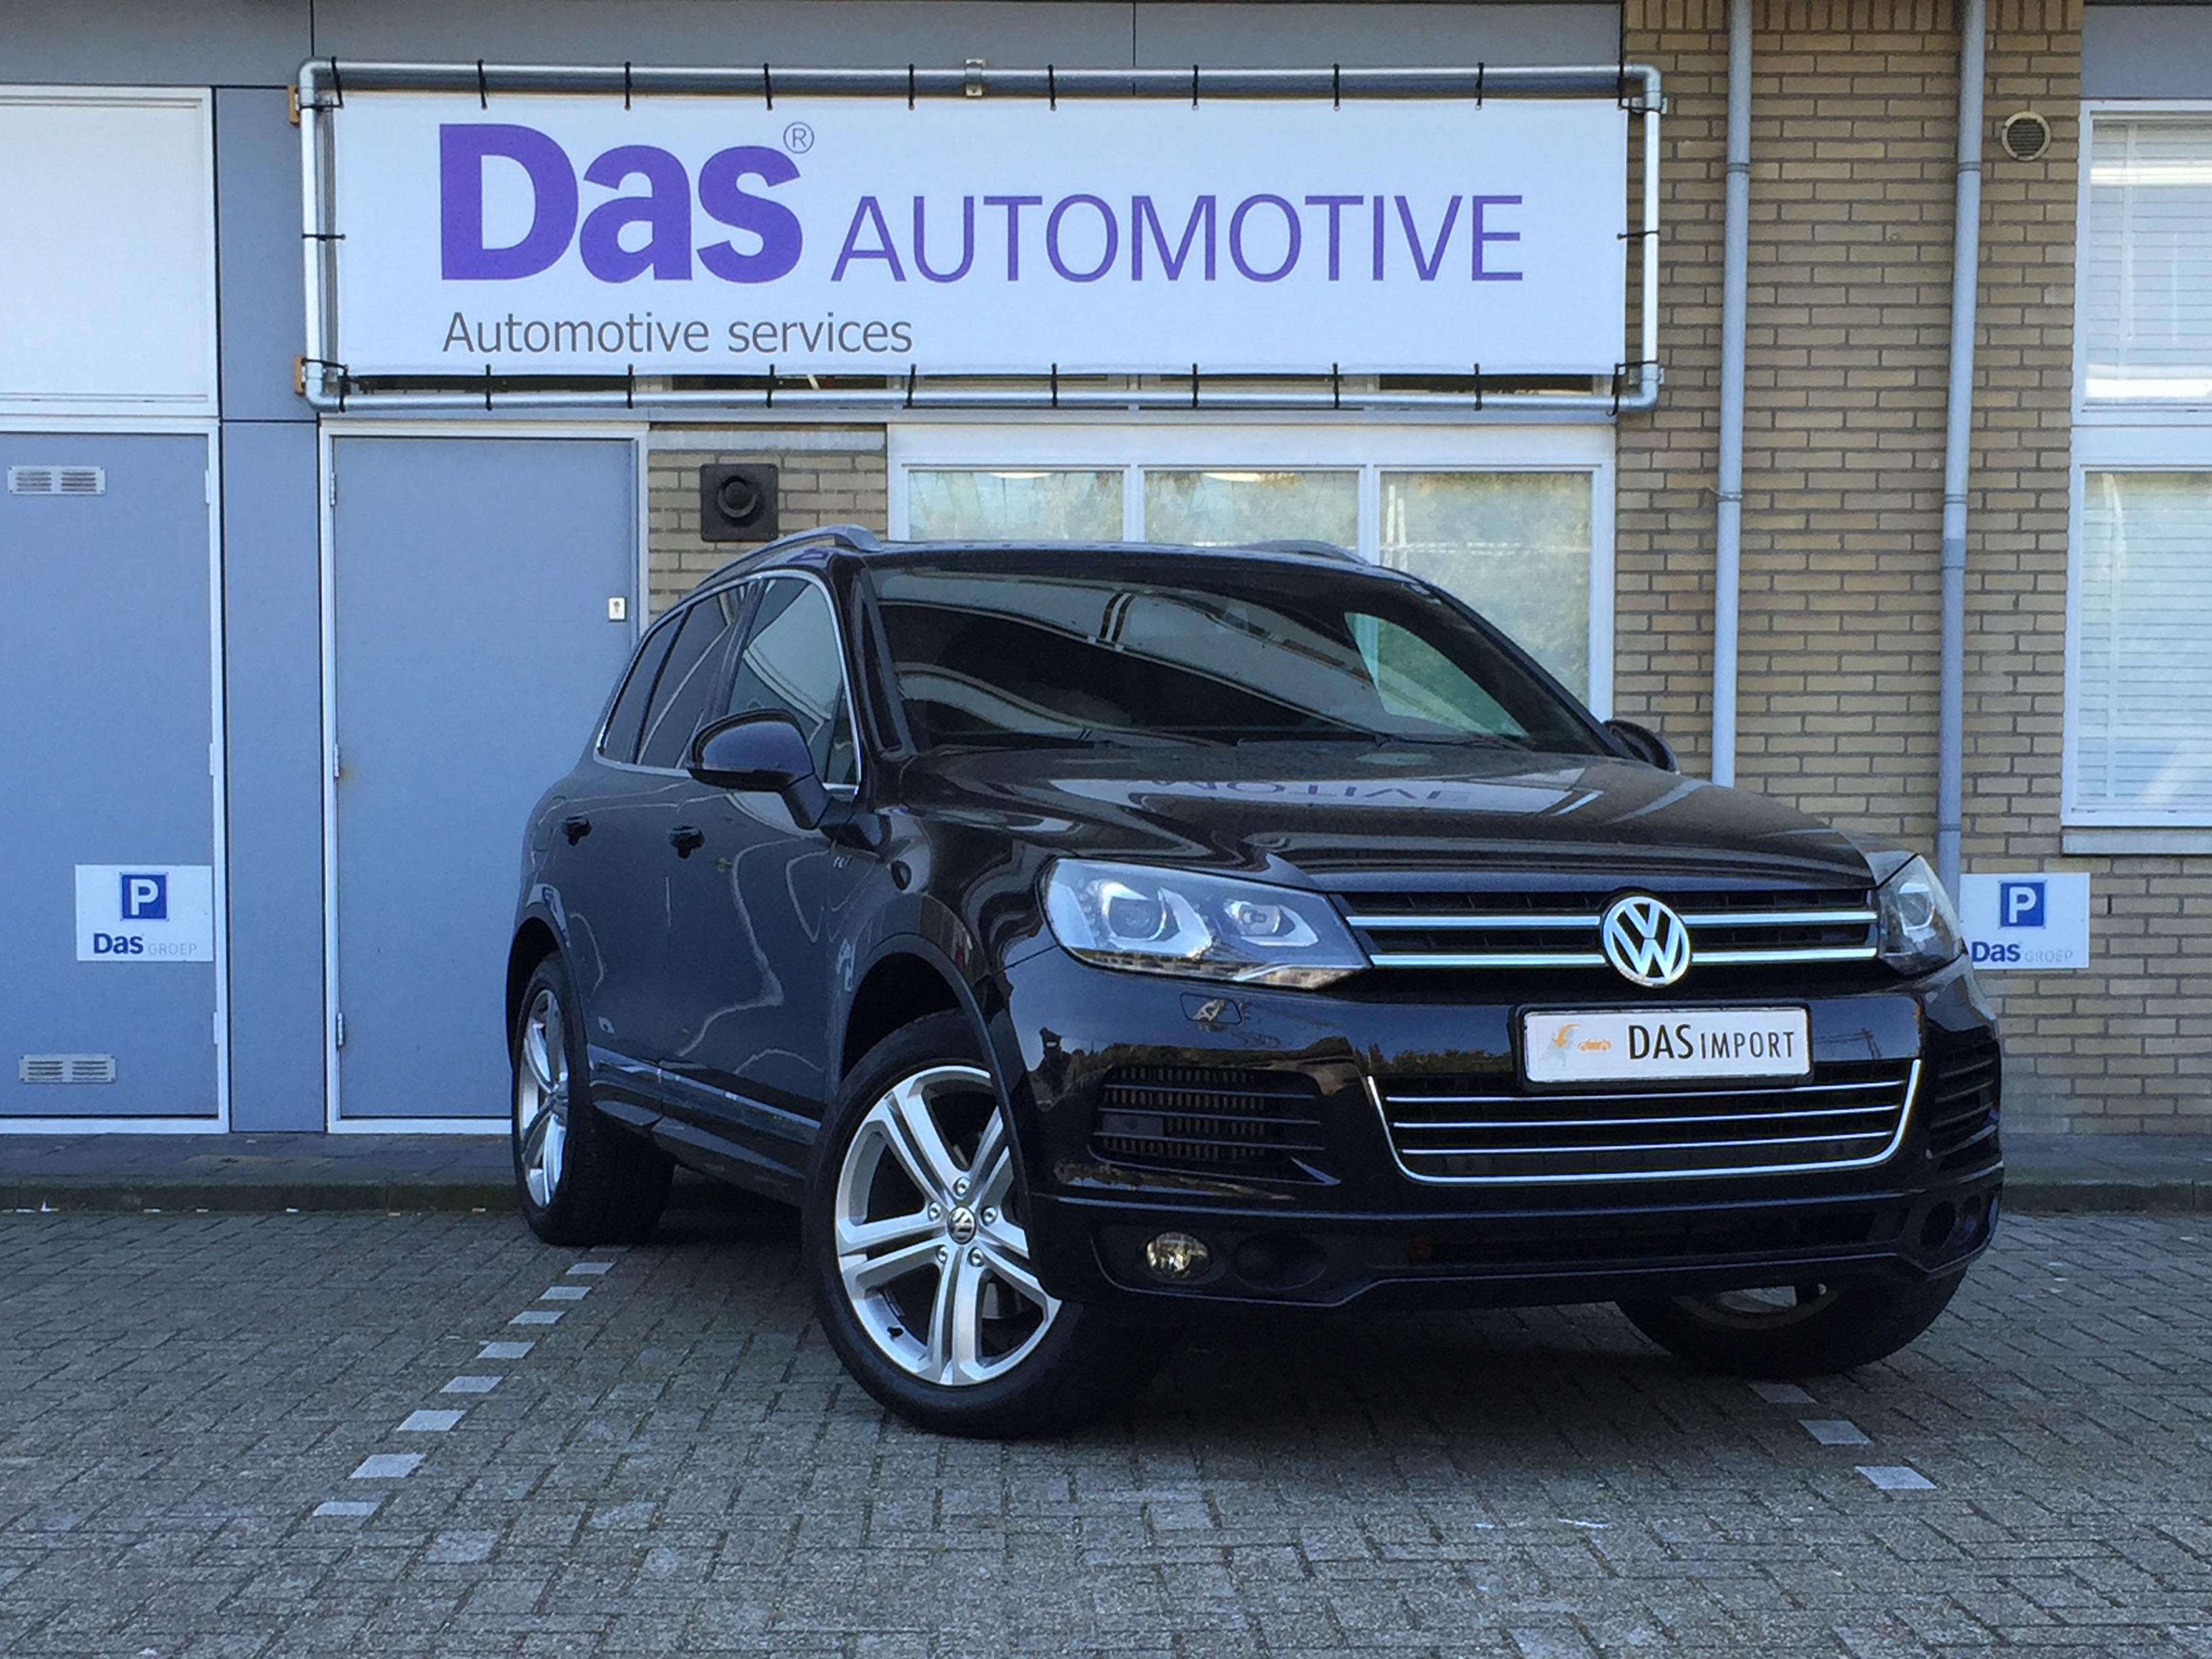 Importauto: Volkswagen Touareg Diesel 3.0 V6 TDI 180 kW BMT R-Line Edition 9/2013